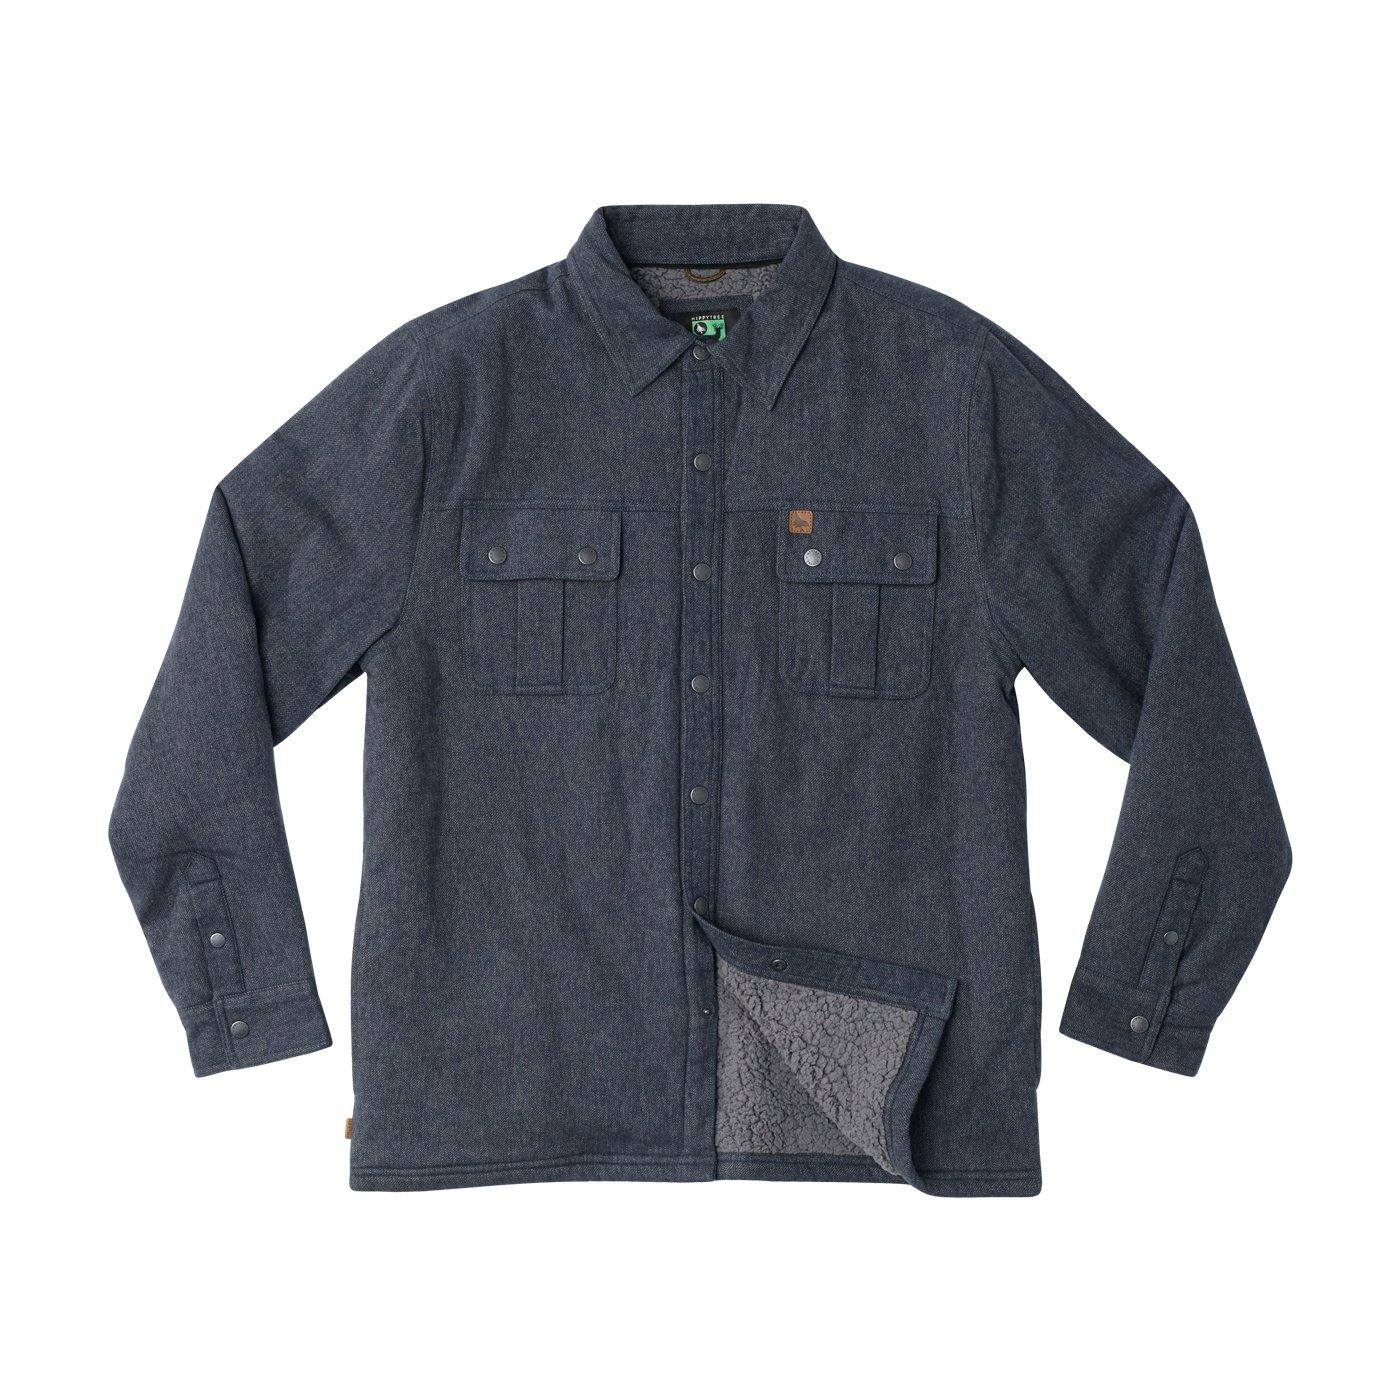 HippyTree Modesto Jacket